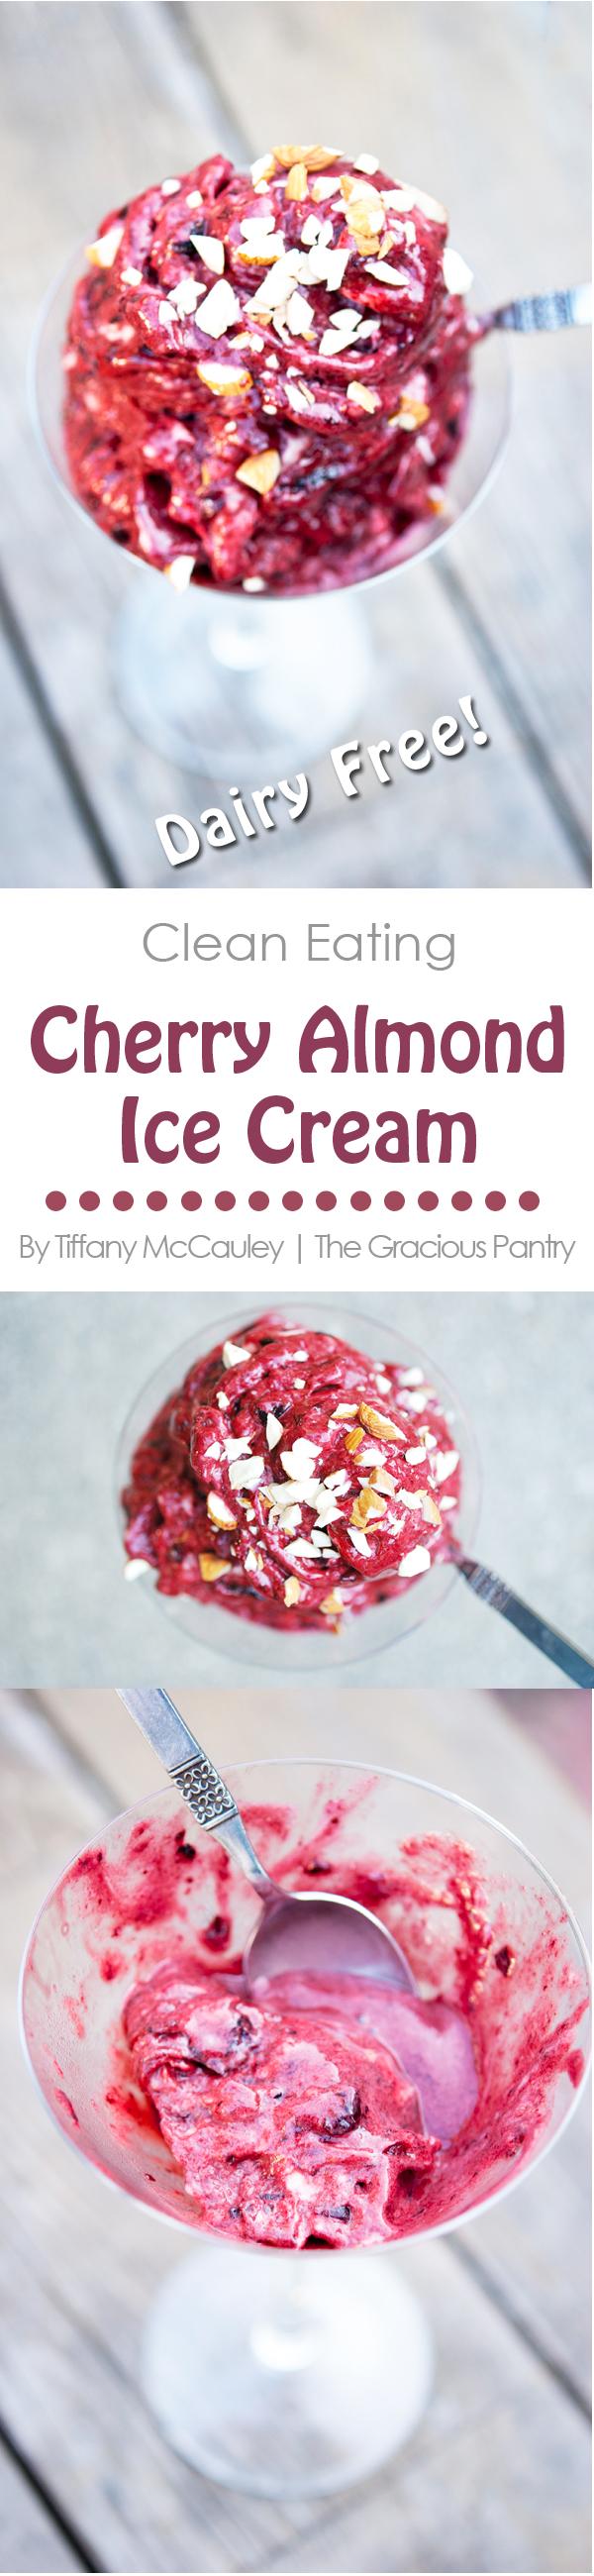 Clean Eating Cherry Almond Ice Cream Recipe #proteinicecream